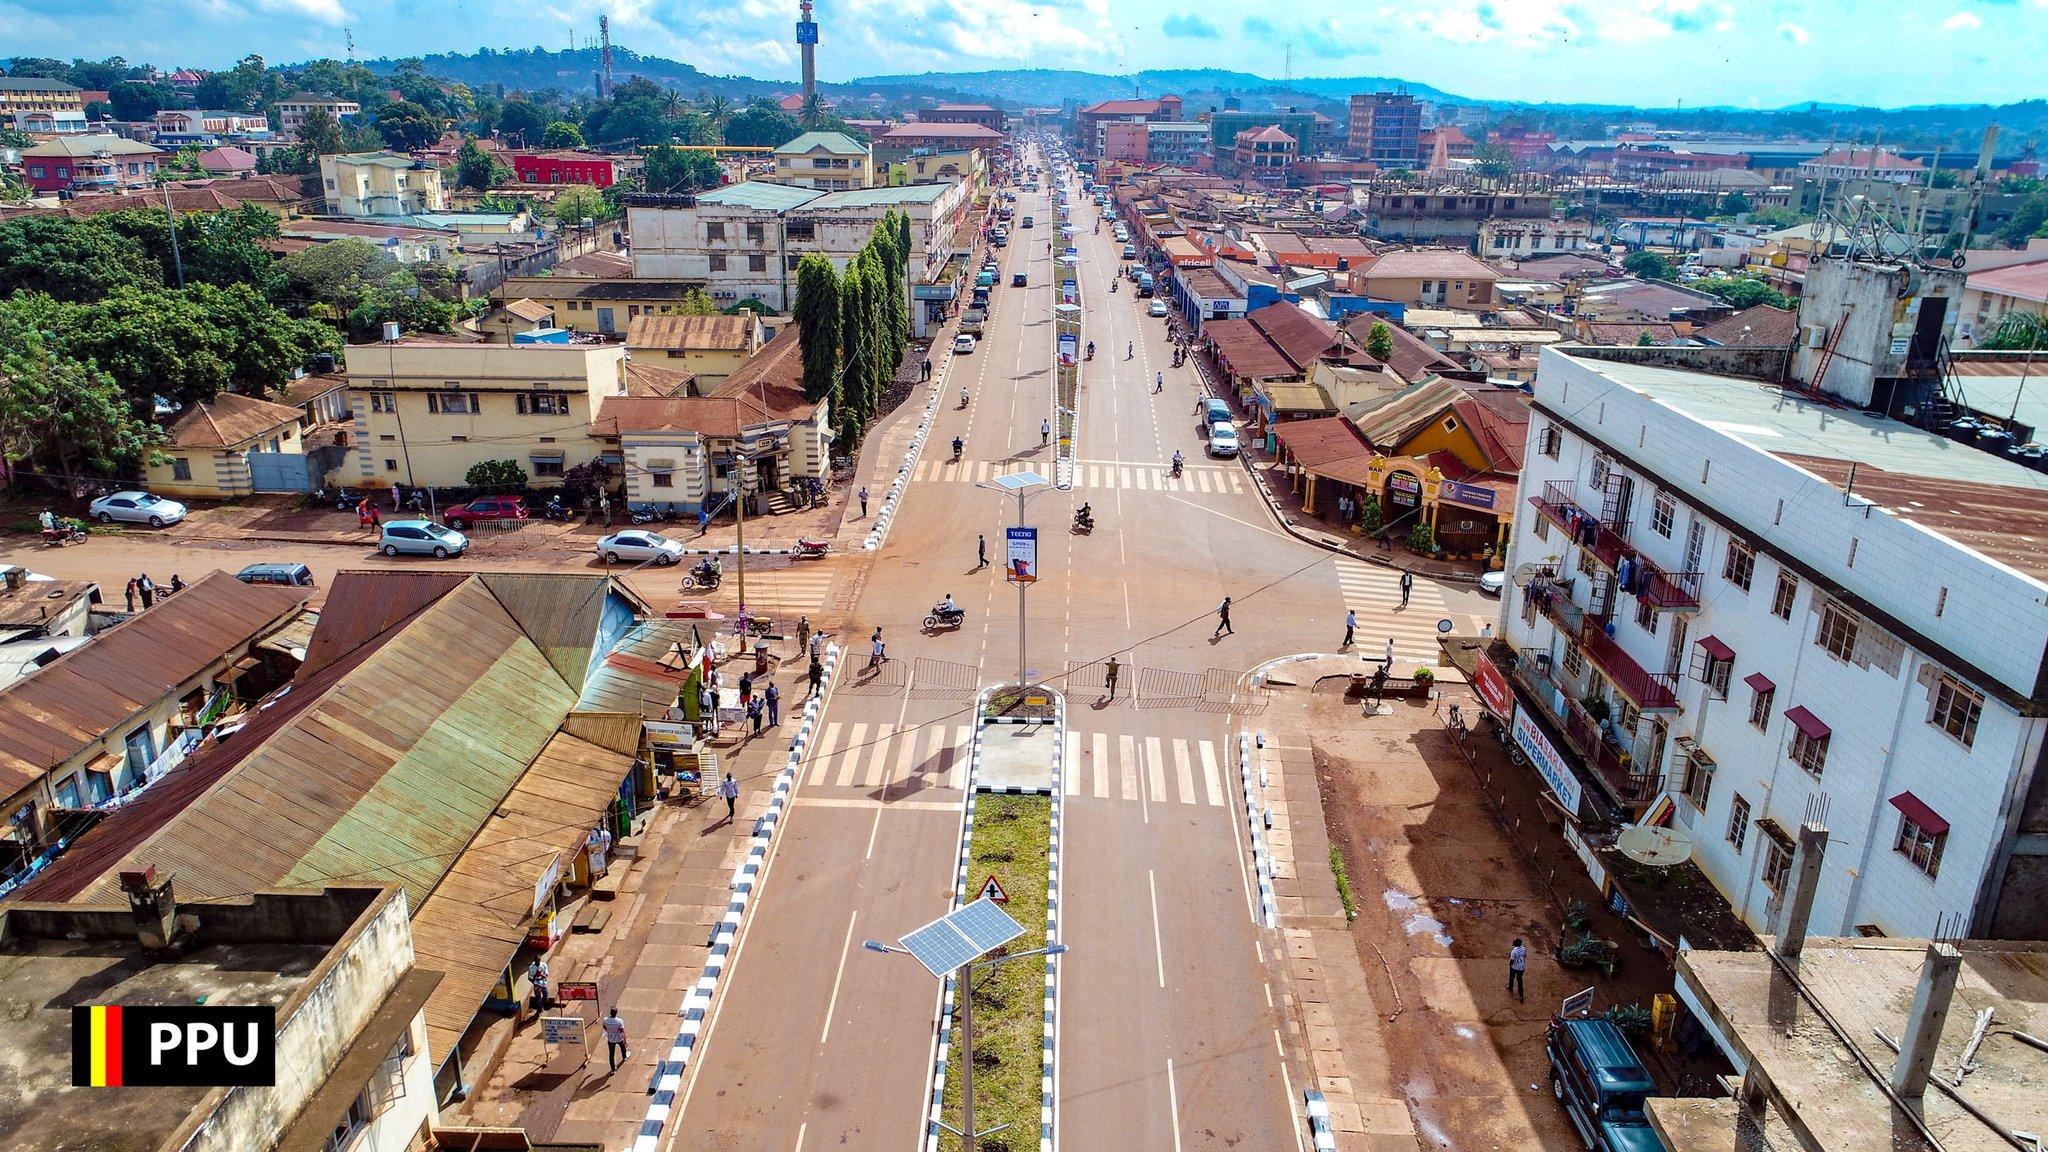 Uganda unveils 7 new cities - FurtherAfrica